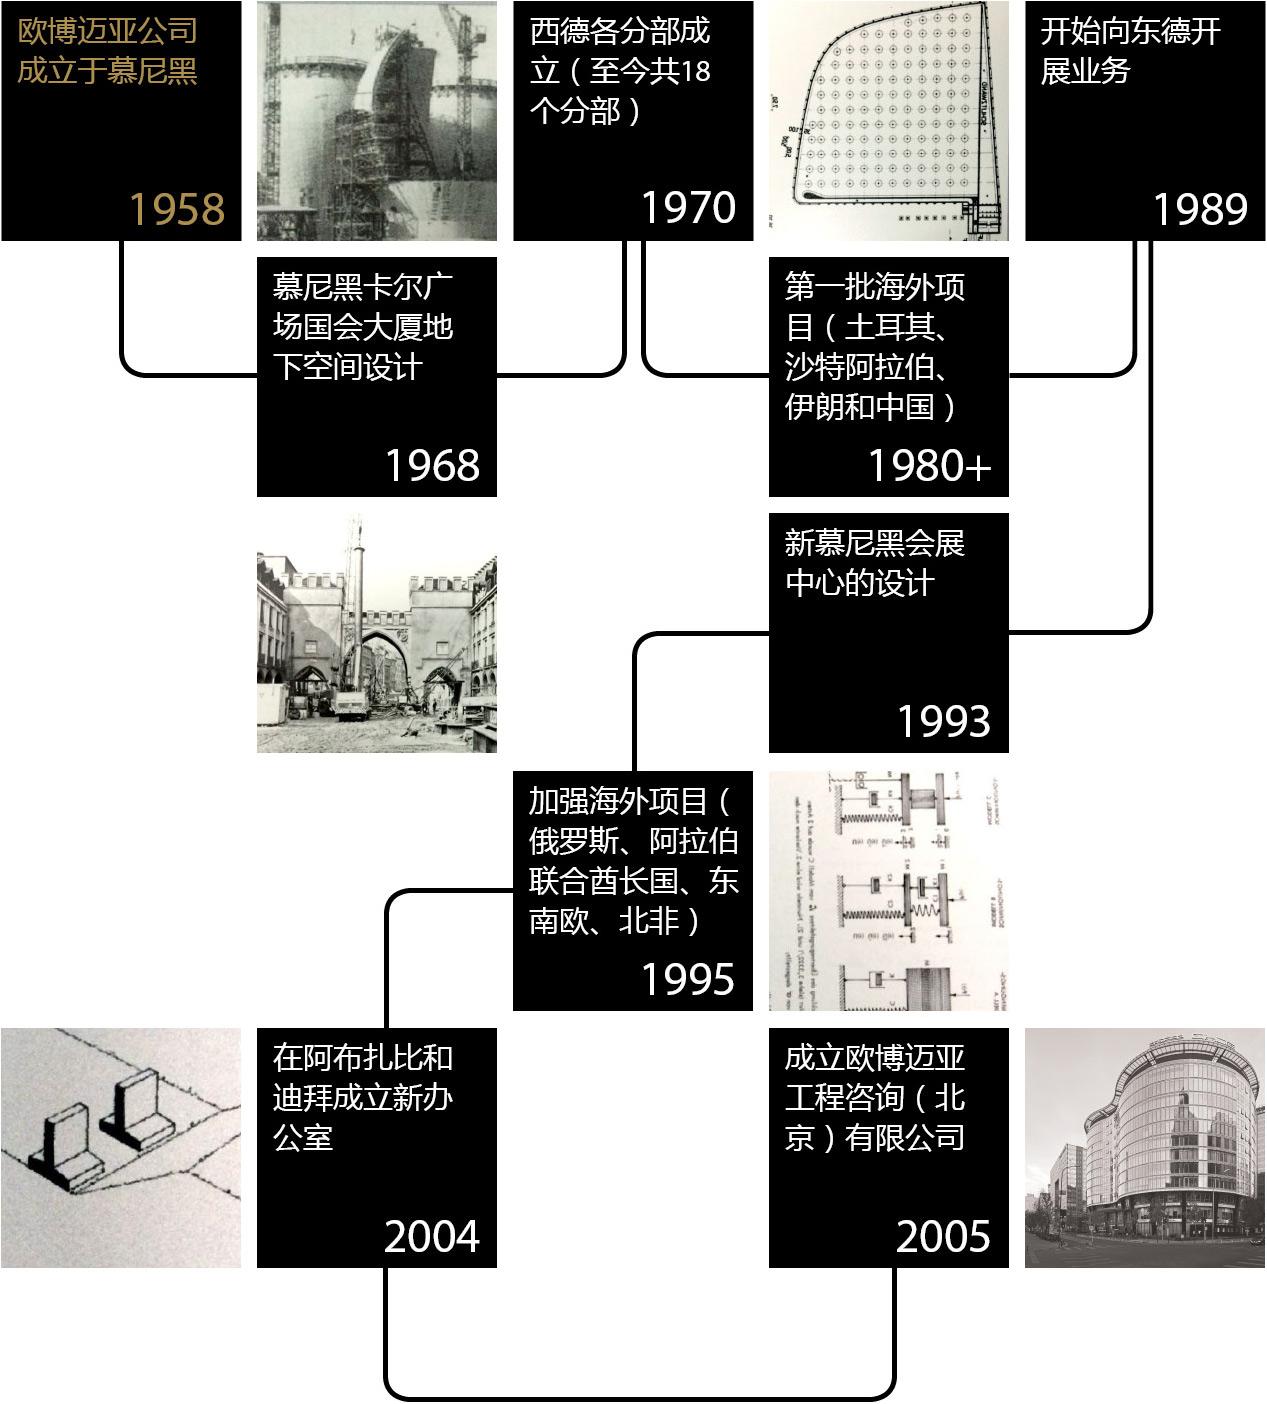 OBERMEYER History